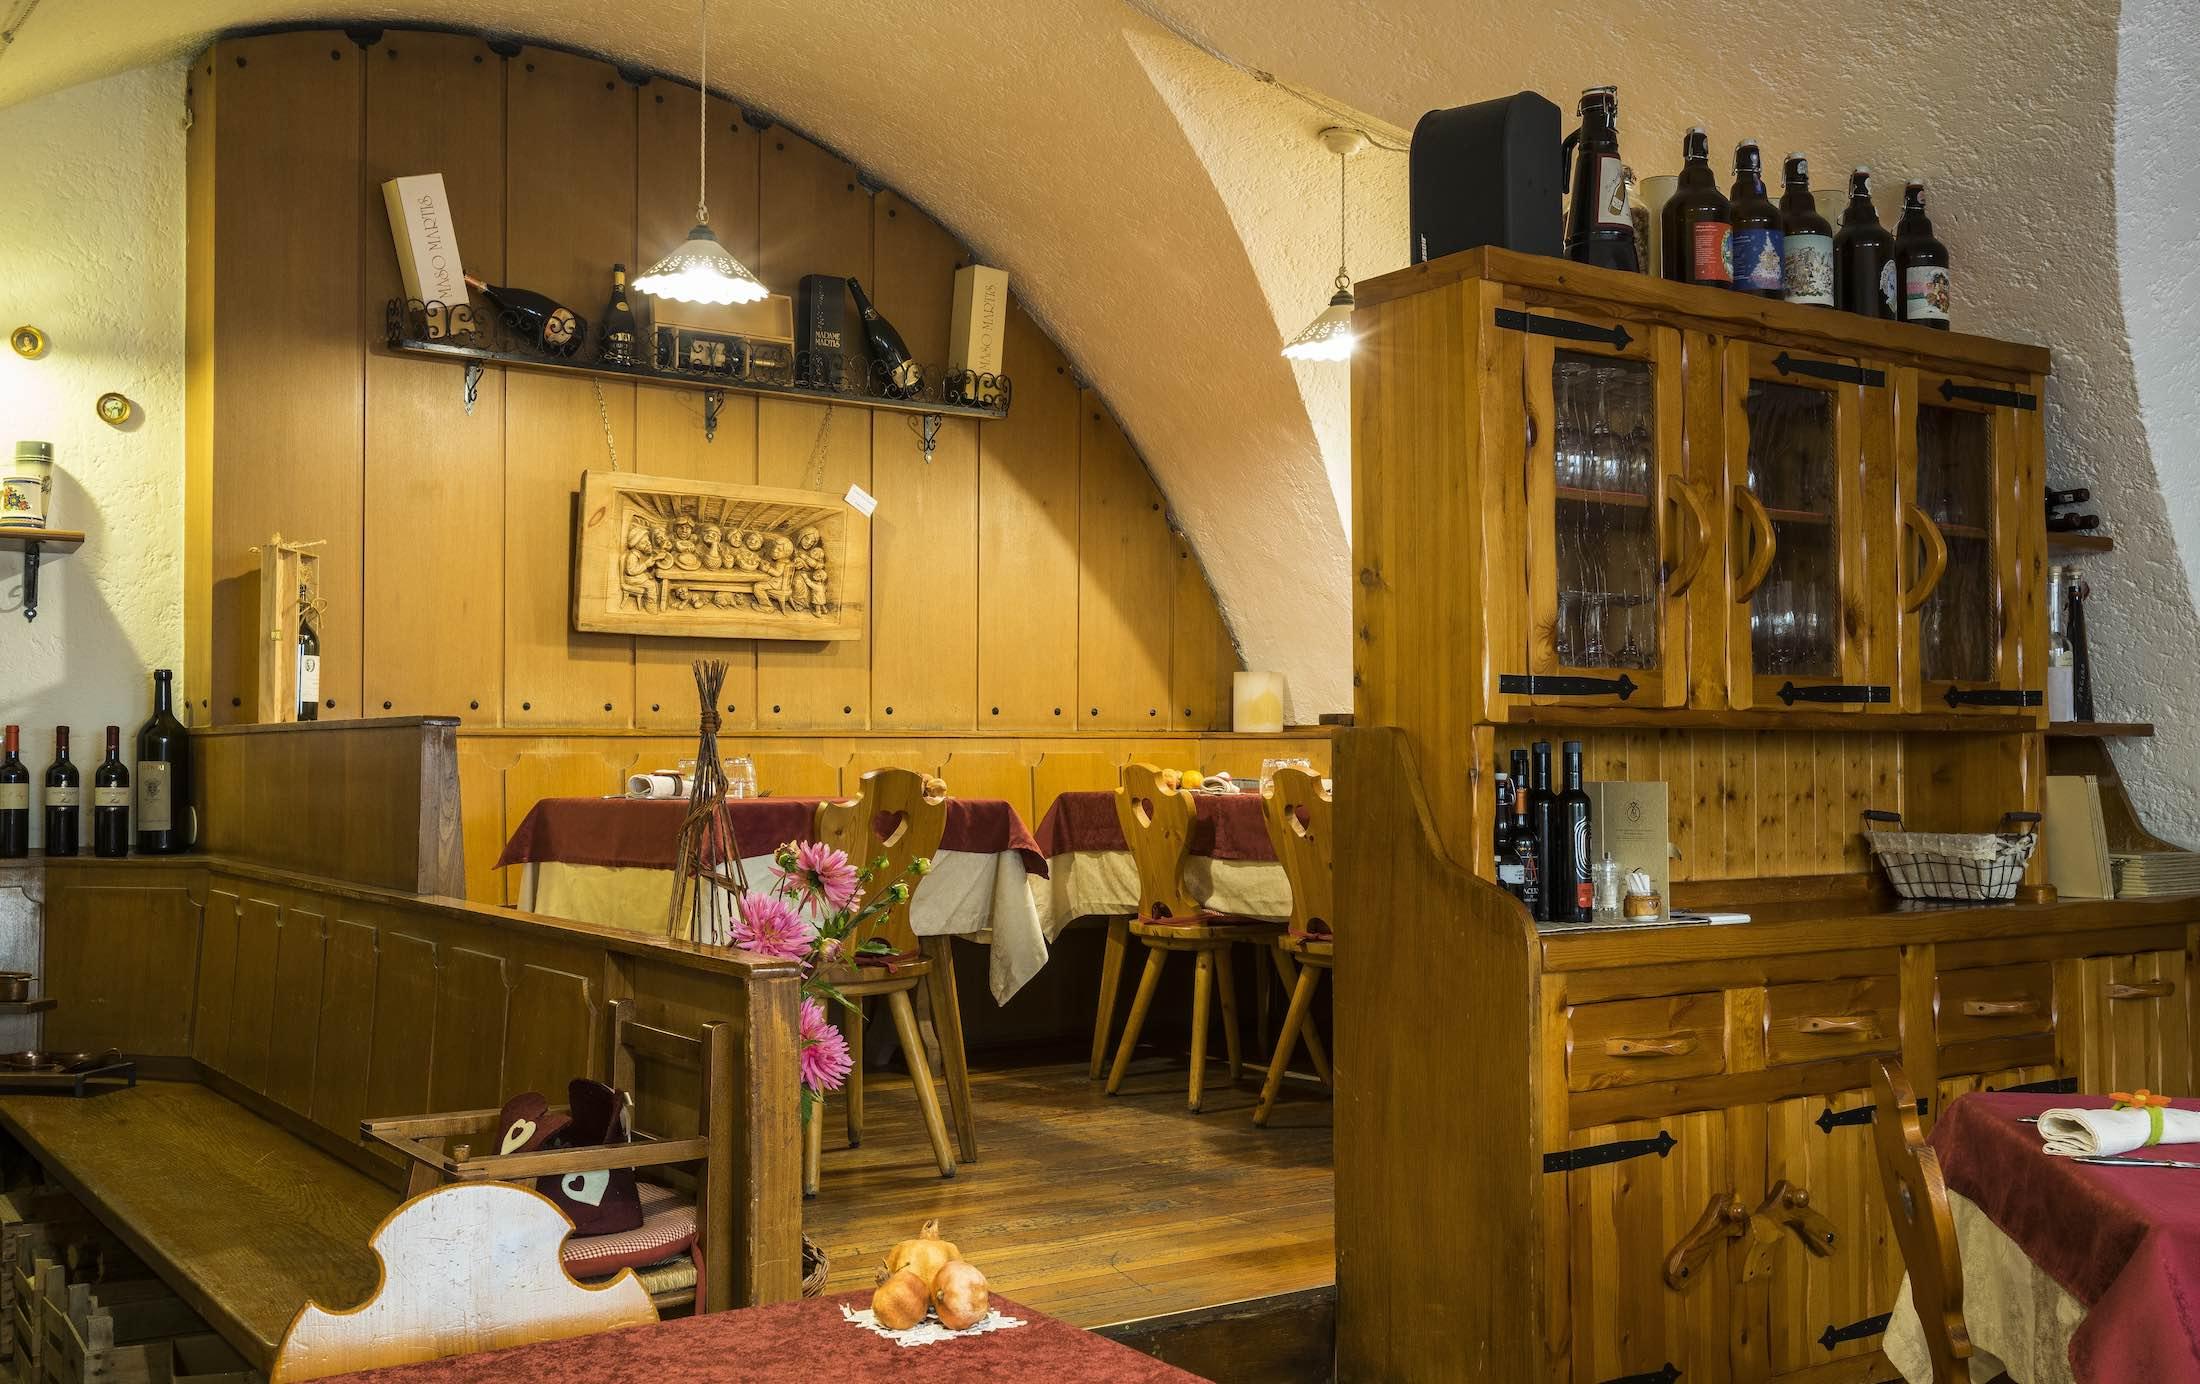 cucina-tipica_ristorante-trentino-slow-food